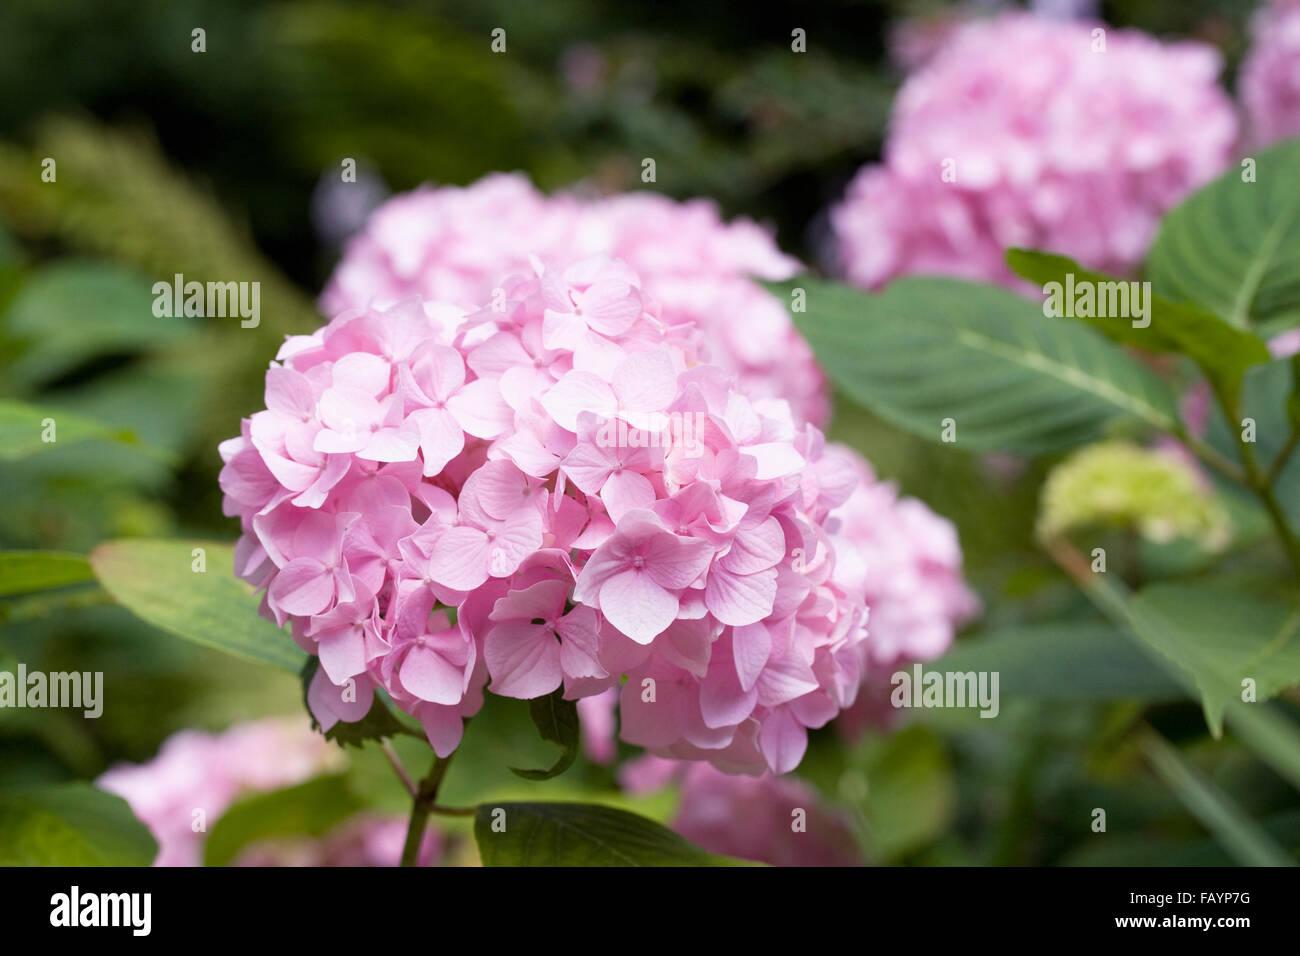 Hydrangea macrophylla. - Stock Image